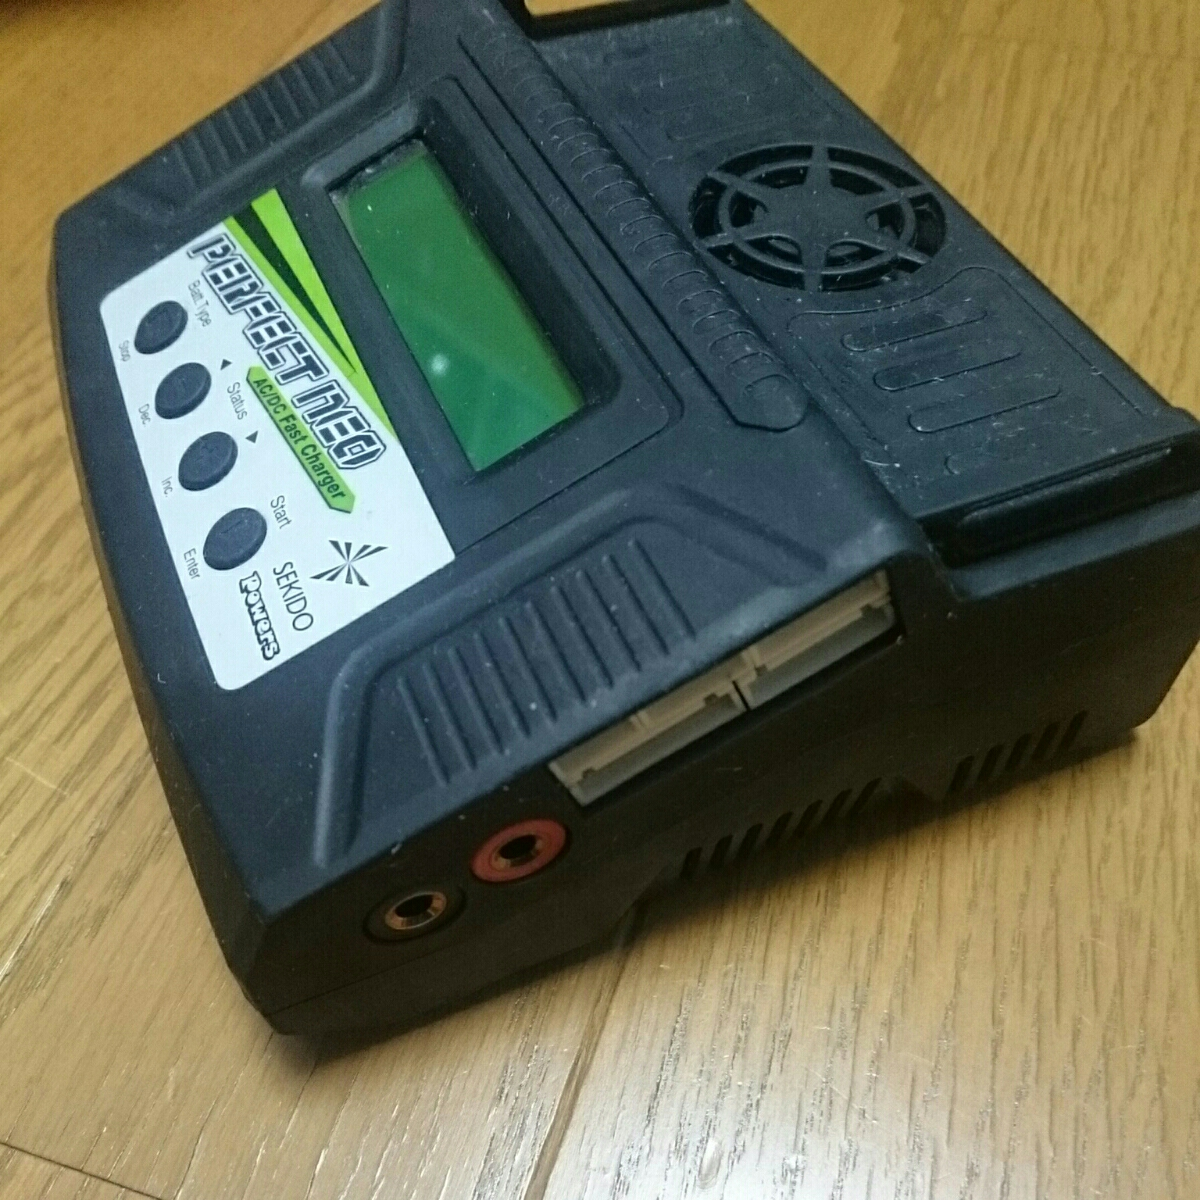 Powers パーフェクト ネオ 急速充電器 動作OK ジャンク / リポ、リフェ、ニカド、ニッケル水素_画像6